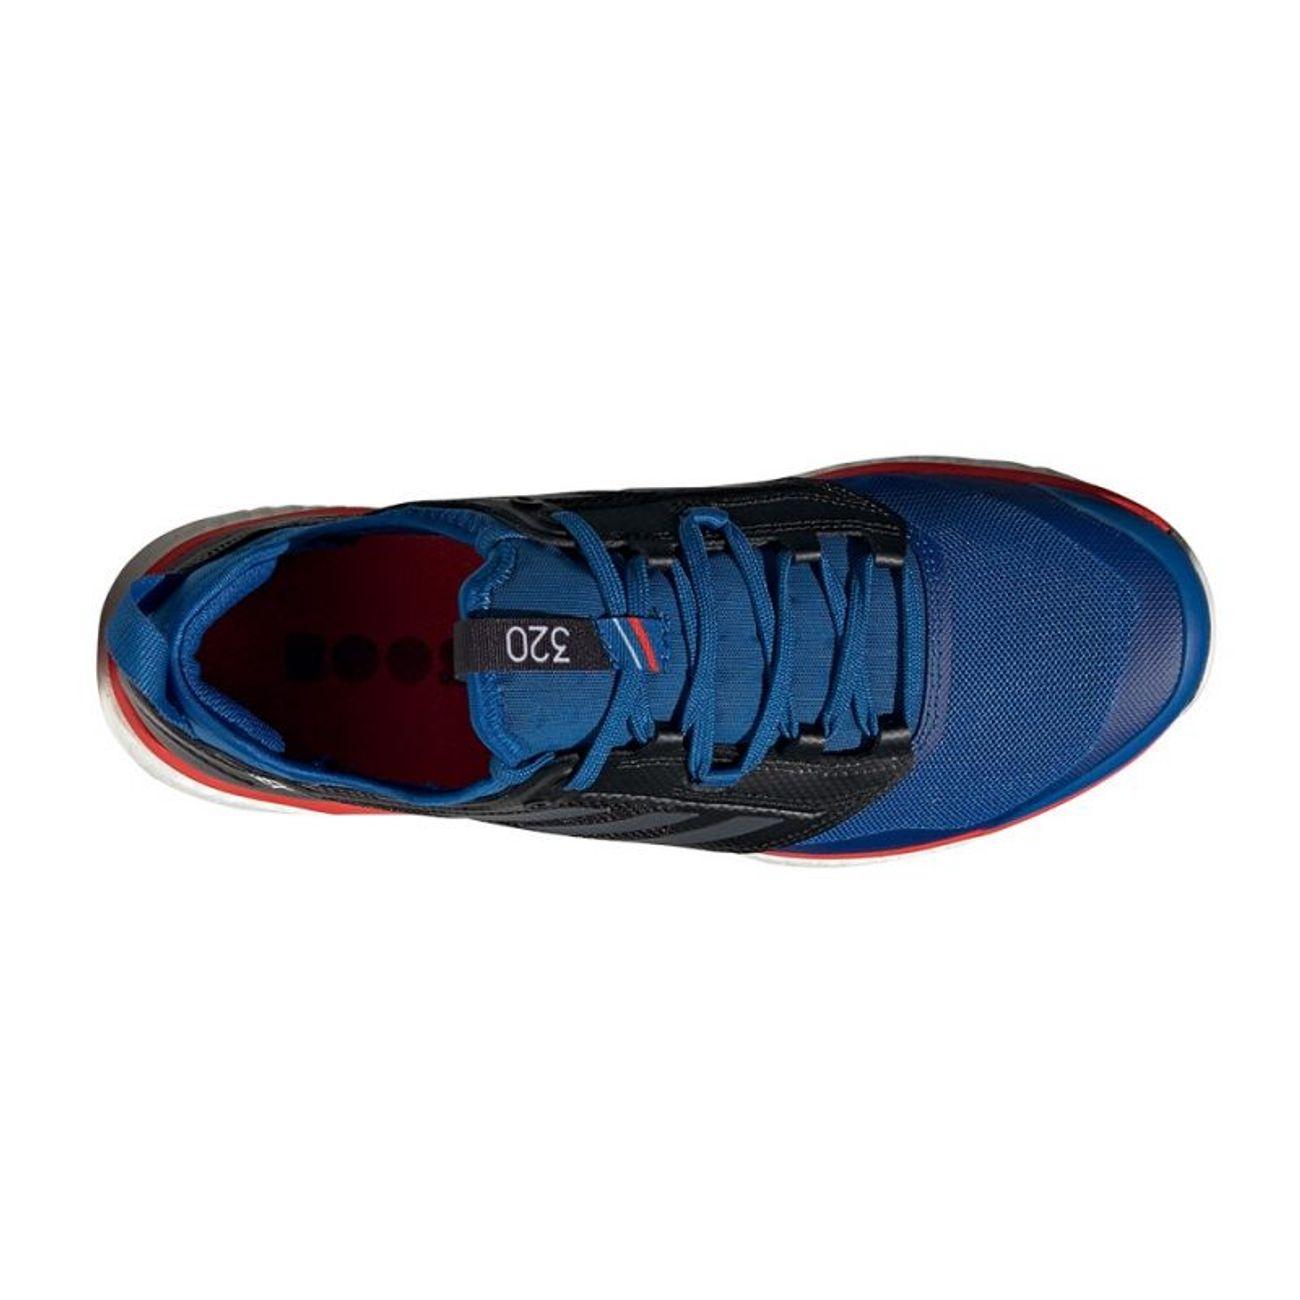 Chaussures Xt Homme Noir Adidas Bleu Terrex Agravic Rouge TcFlK13uJ